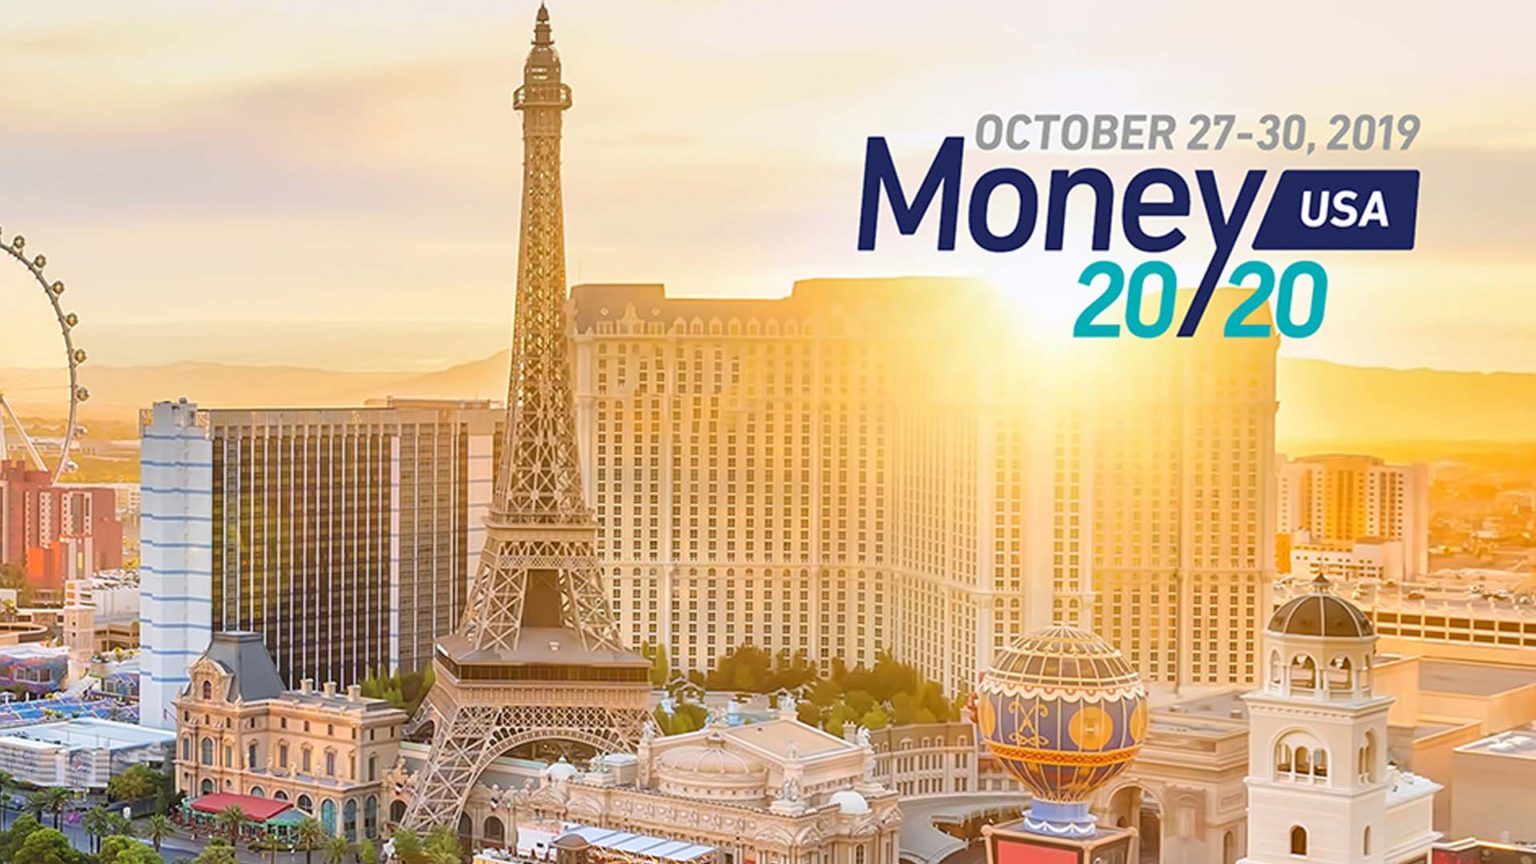 money2020_2019 logo